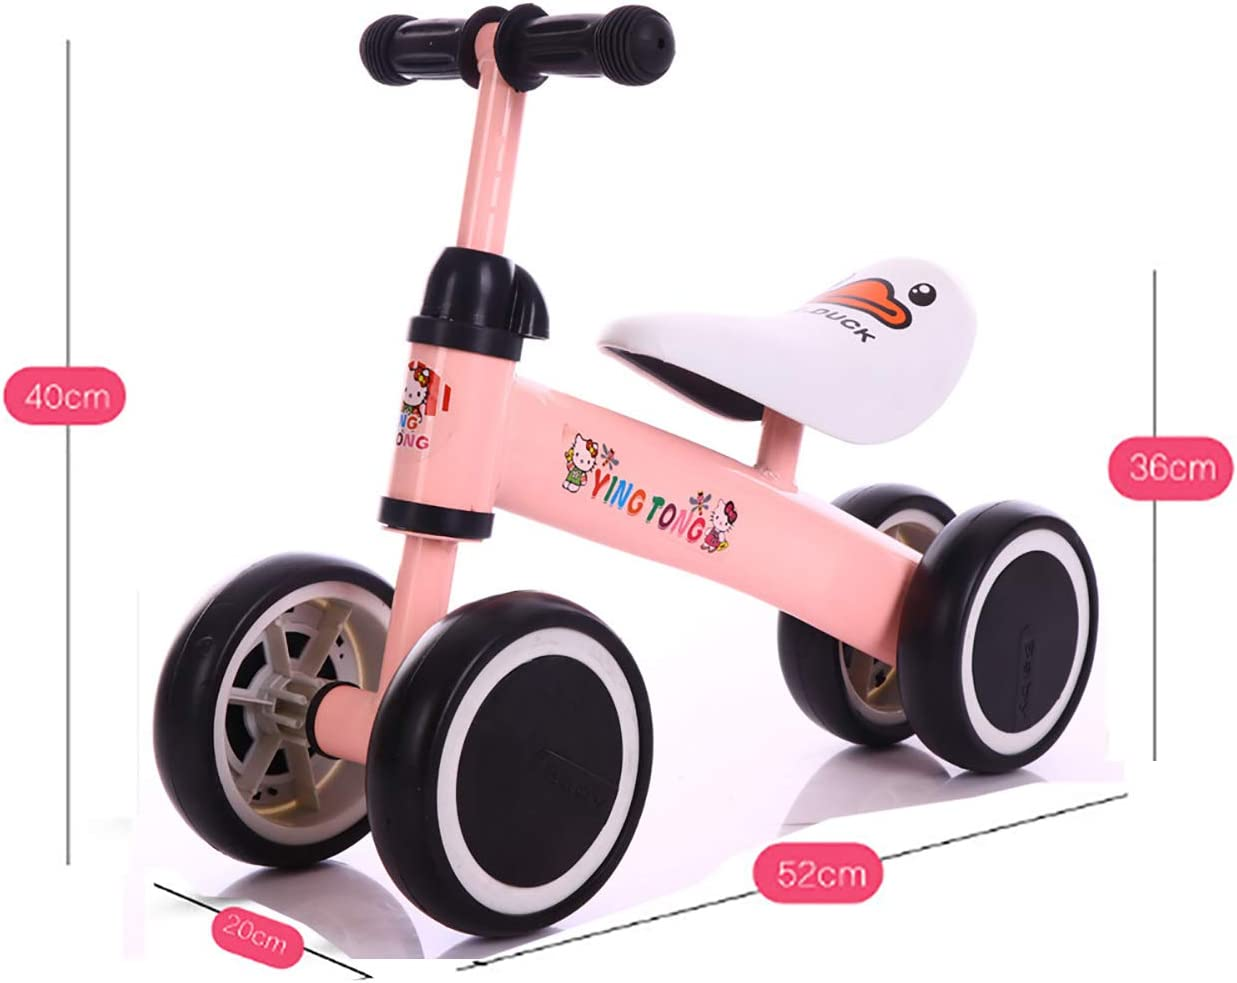 ZXDBK Bicicleta de Equilibrio, Bici sin Pedales Niño Bicicleta de ...